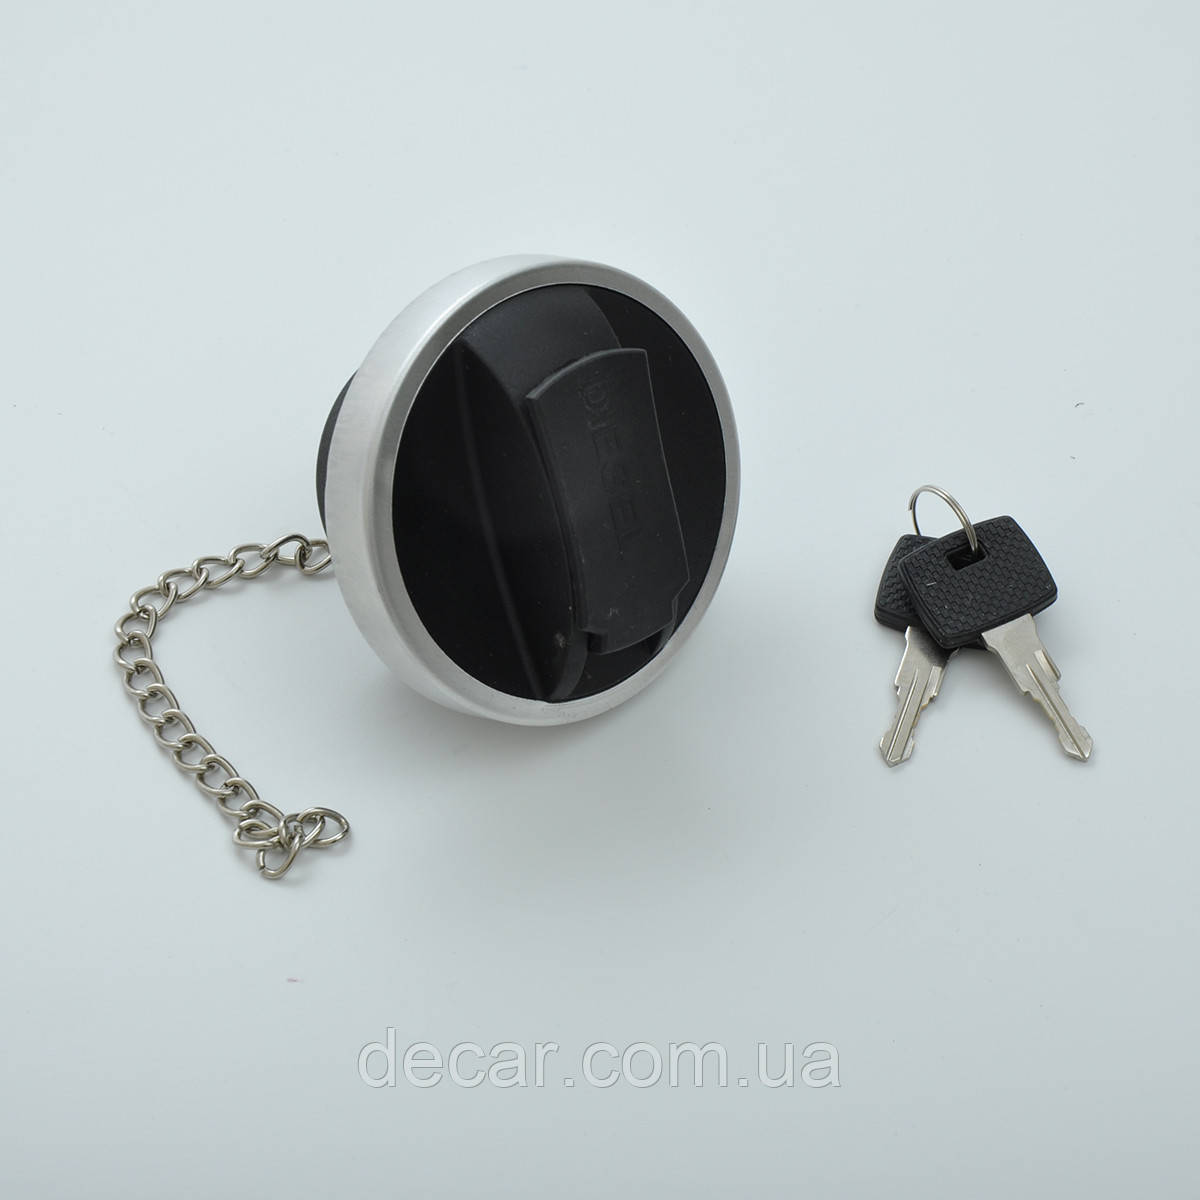 Крышка б/бака TIR черная Турция 051060 Д=60мм/под ключ/с цепочкой(пластиковая)